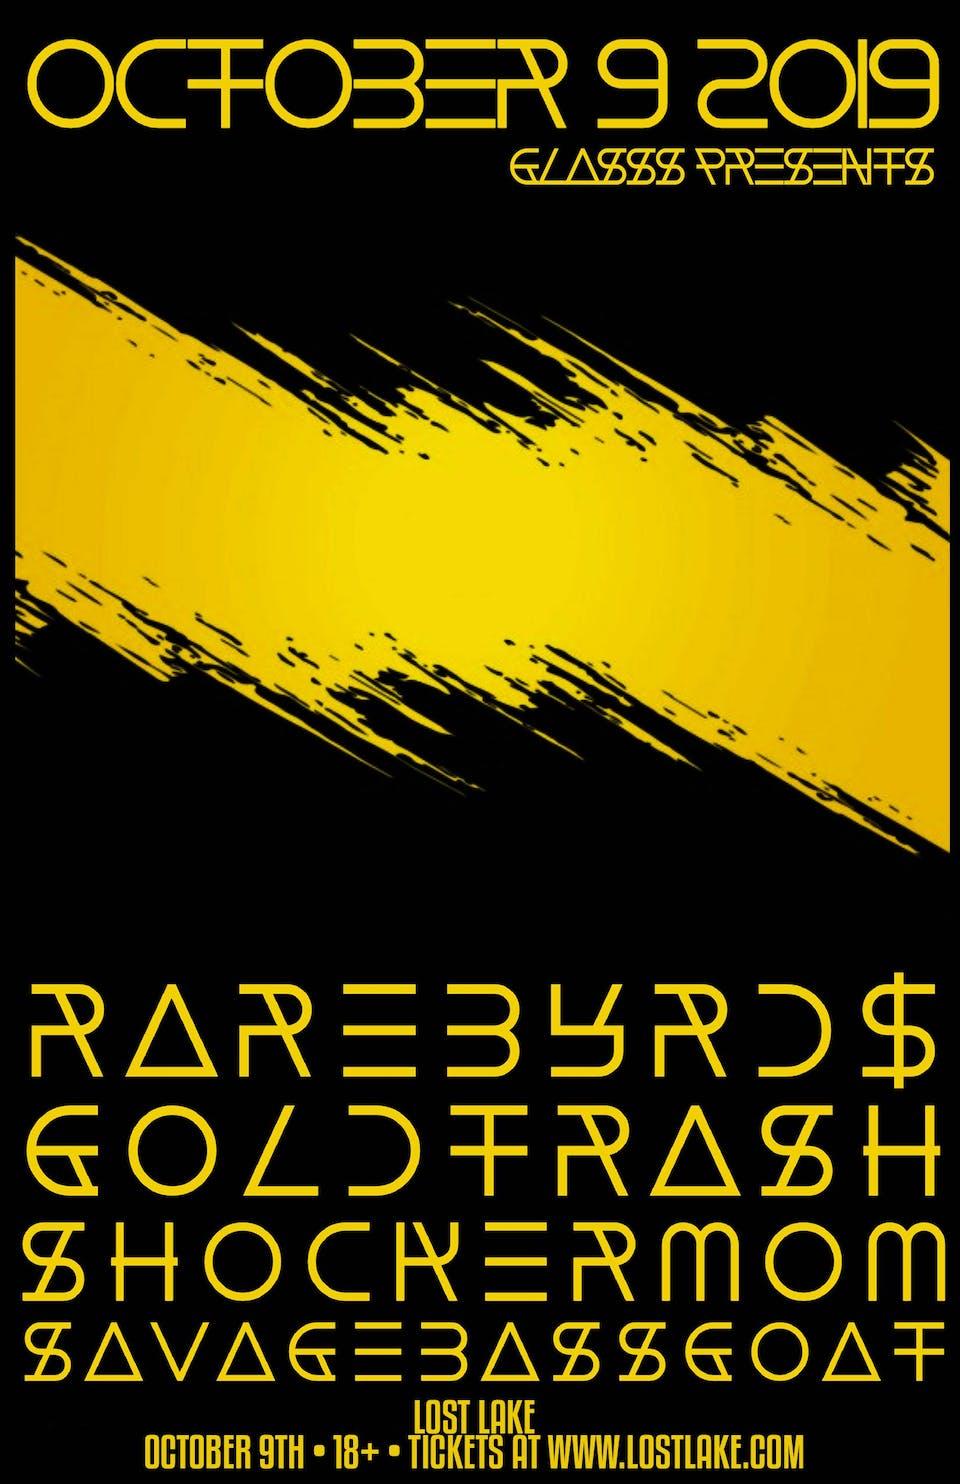 RAREBYRD$/GOLD TRASH / Shocker Mom / Savage Bass Ghost